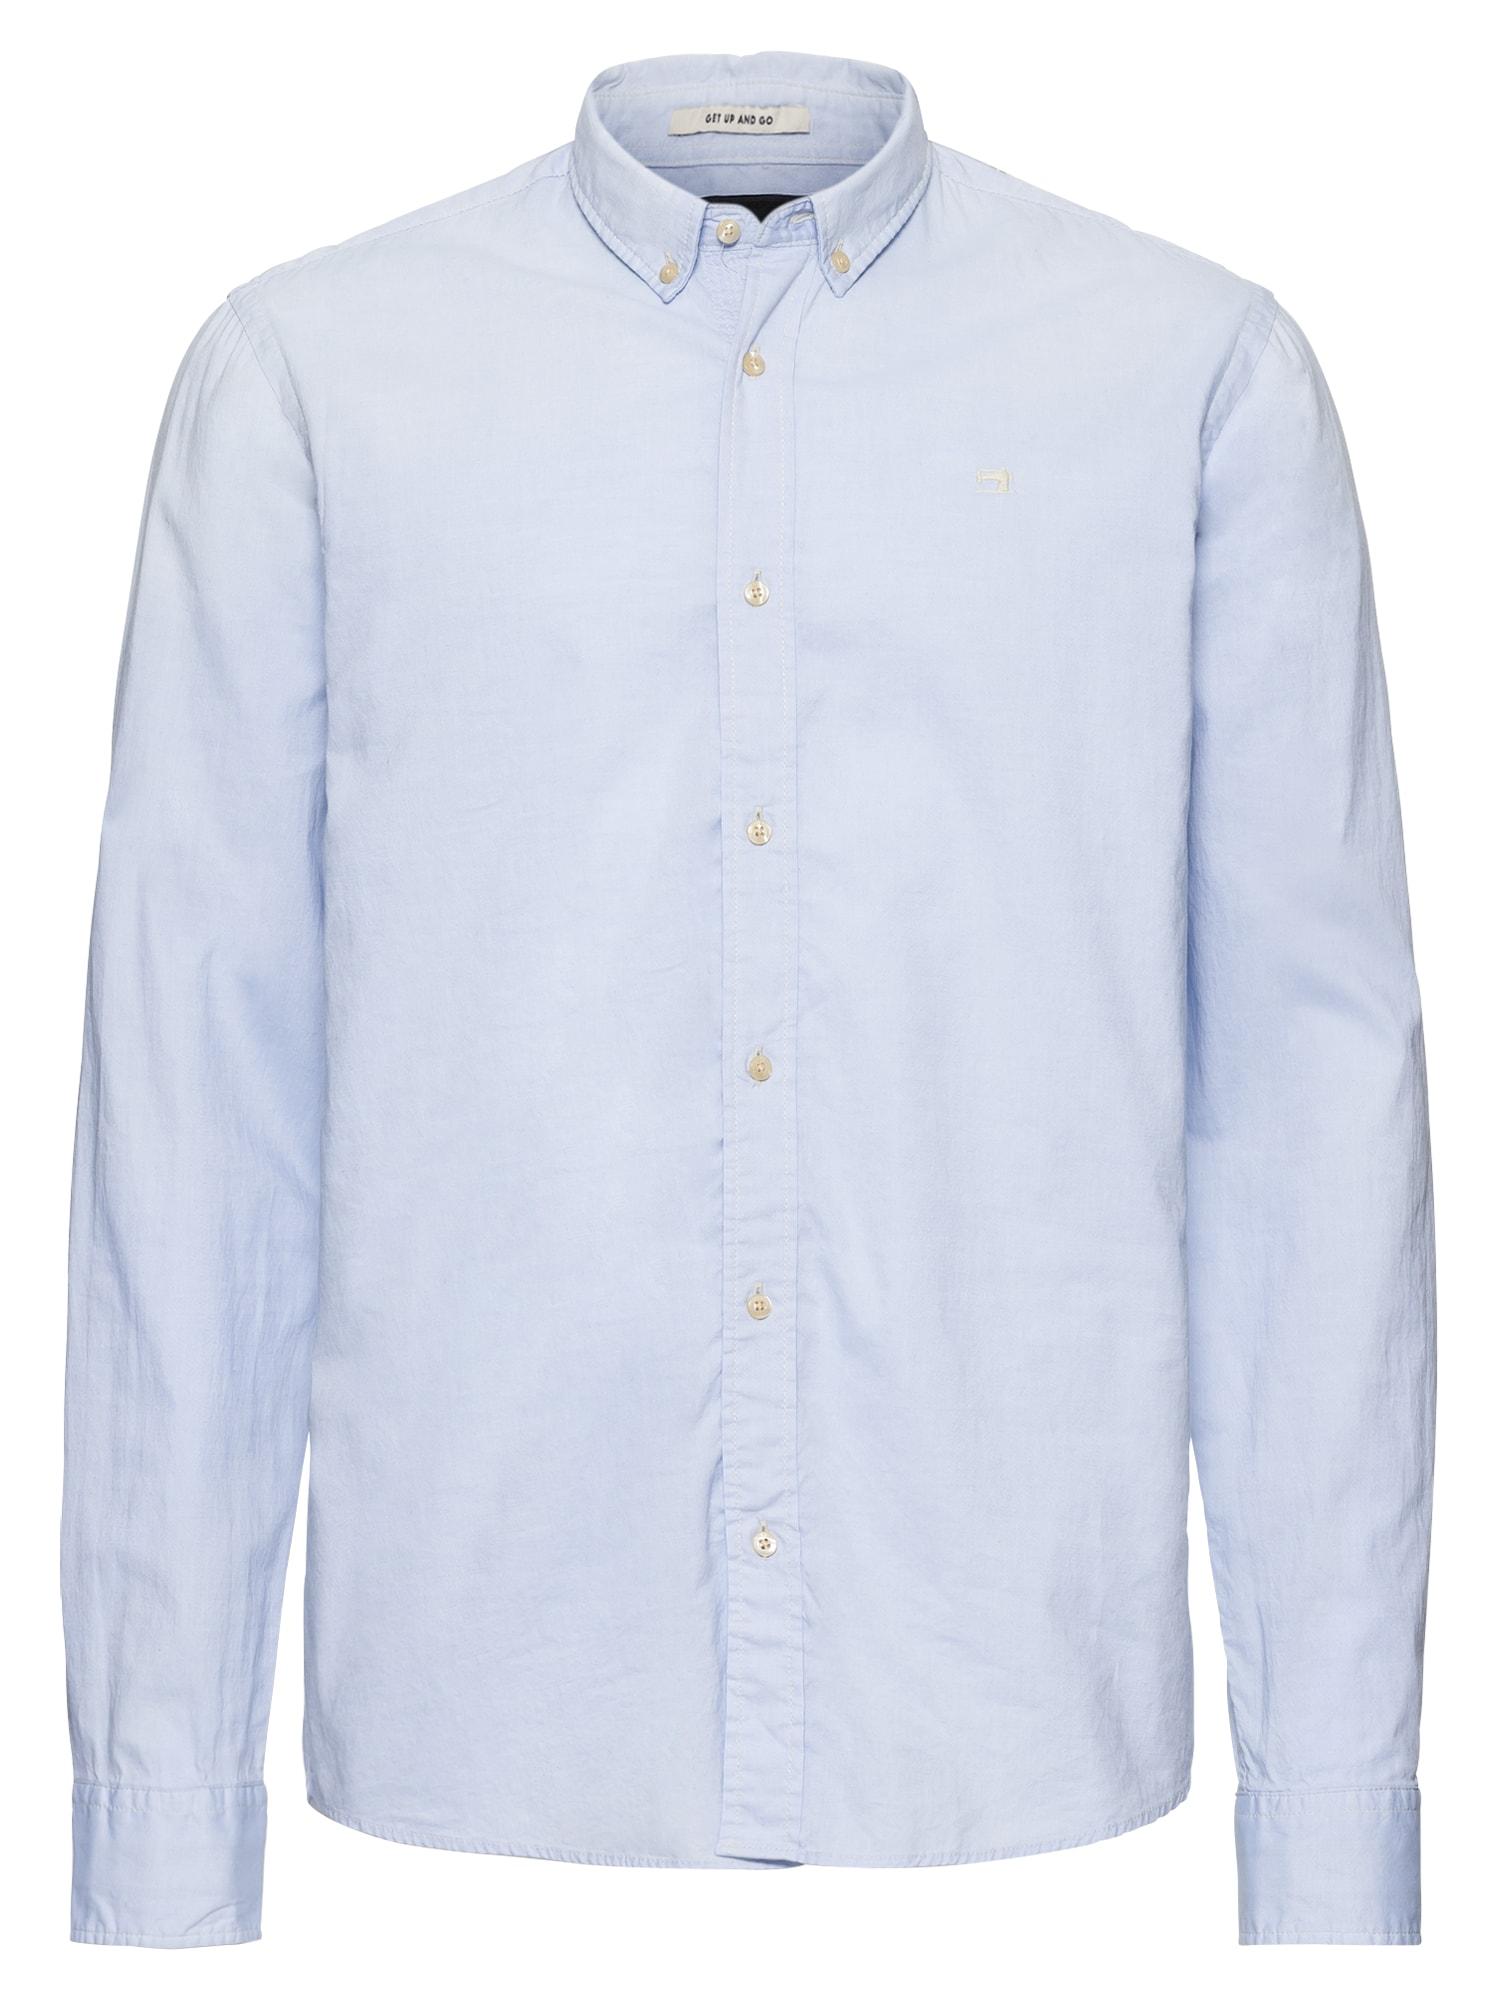 SCOTCH  and  SODA Heren Overhemd REGULAR FIT- Classic oxford shirt lichtblauw